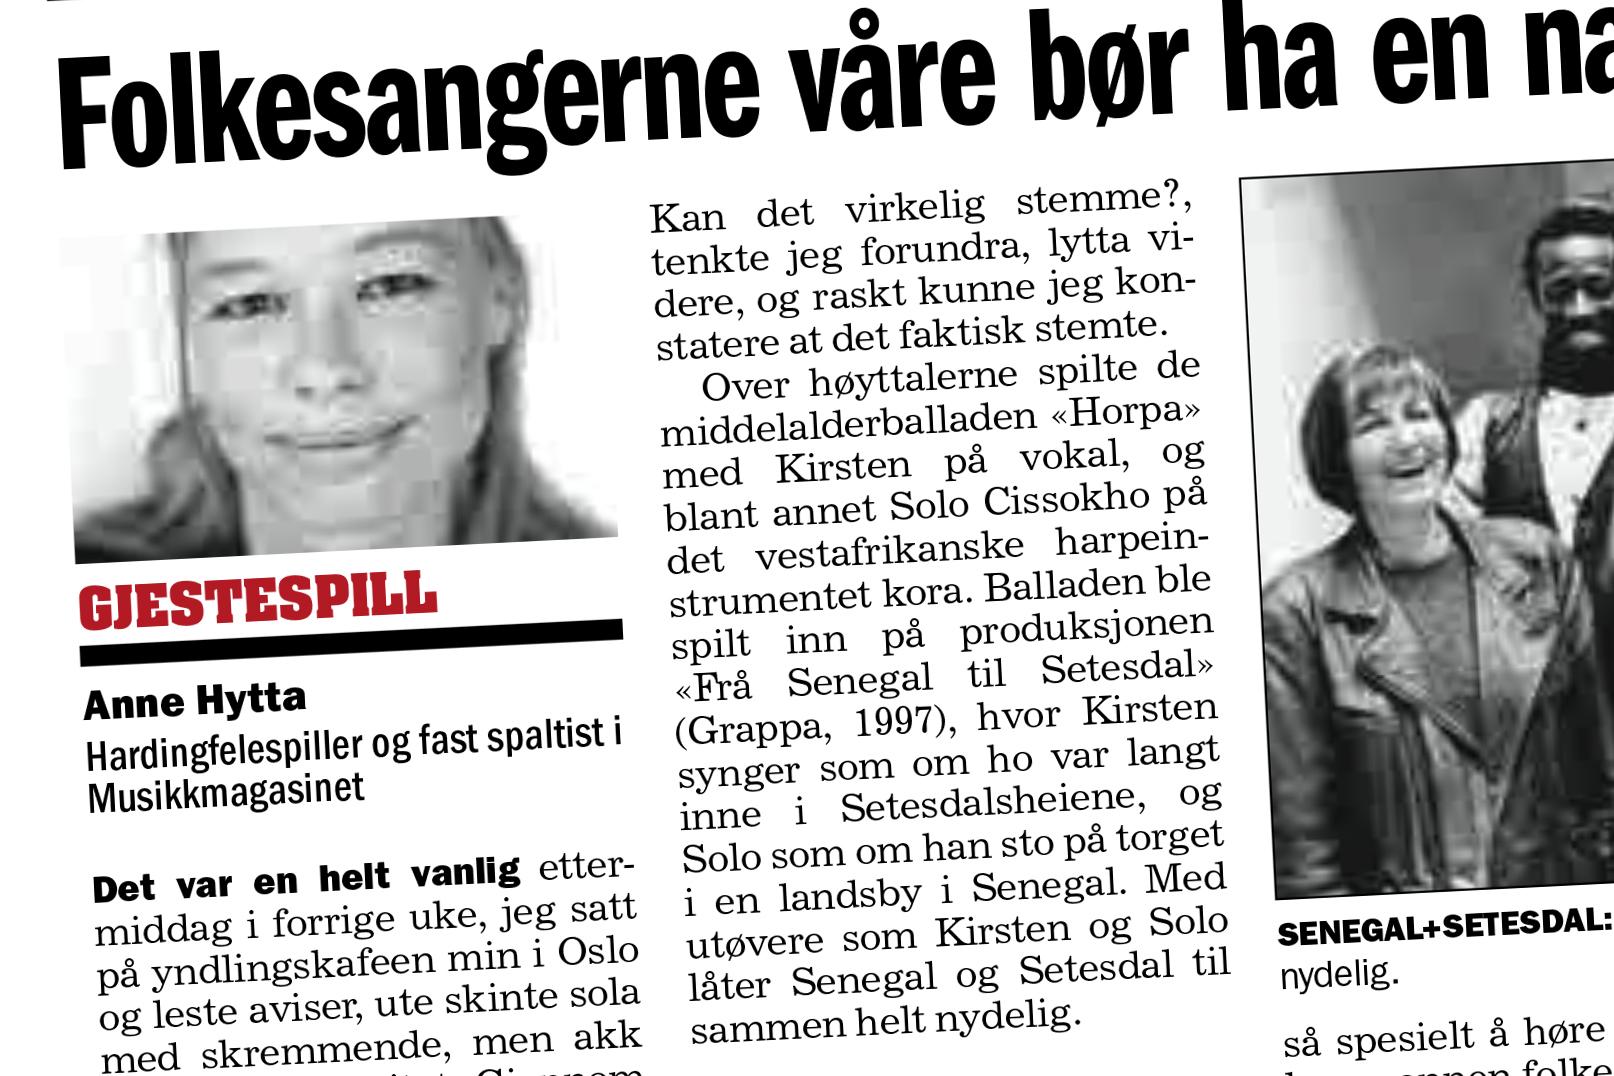 Faksimile frå Klassekampen 5. mai 2014.